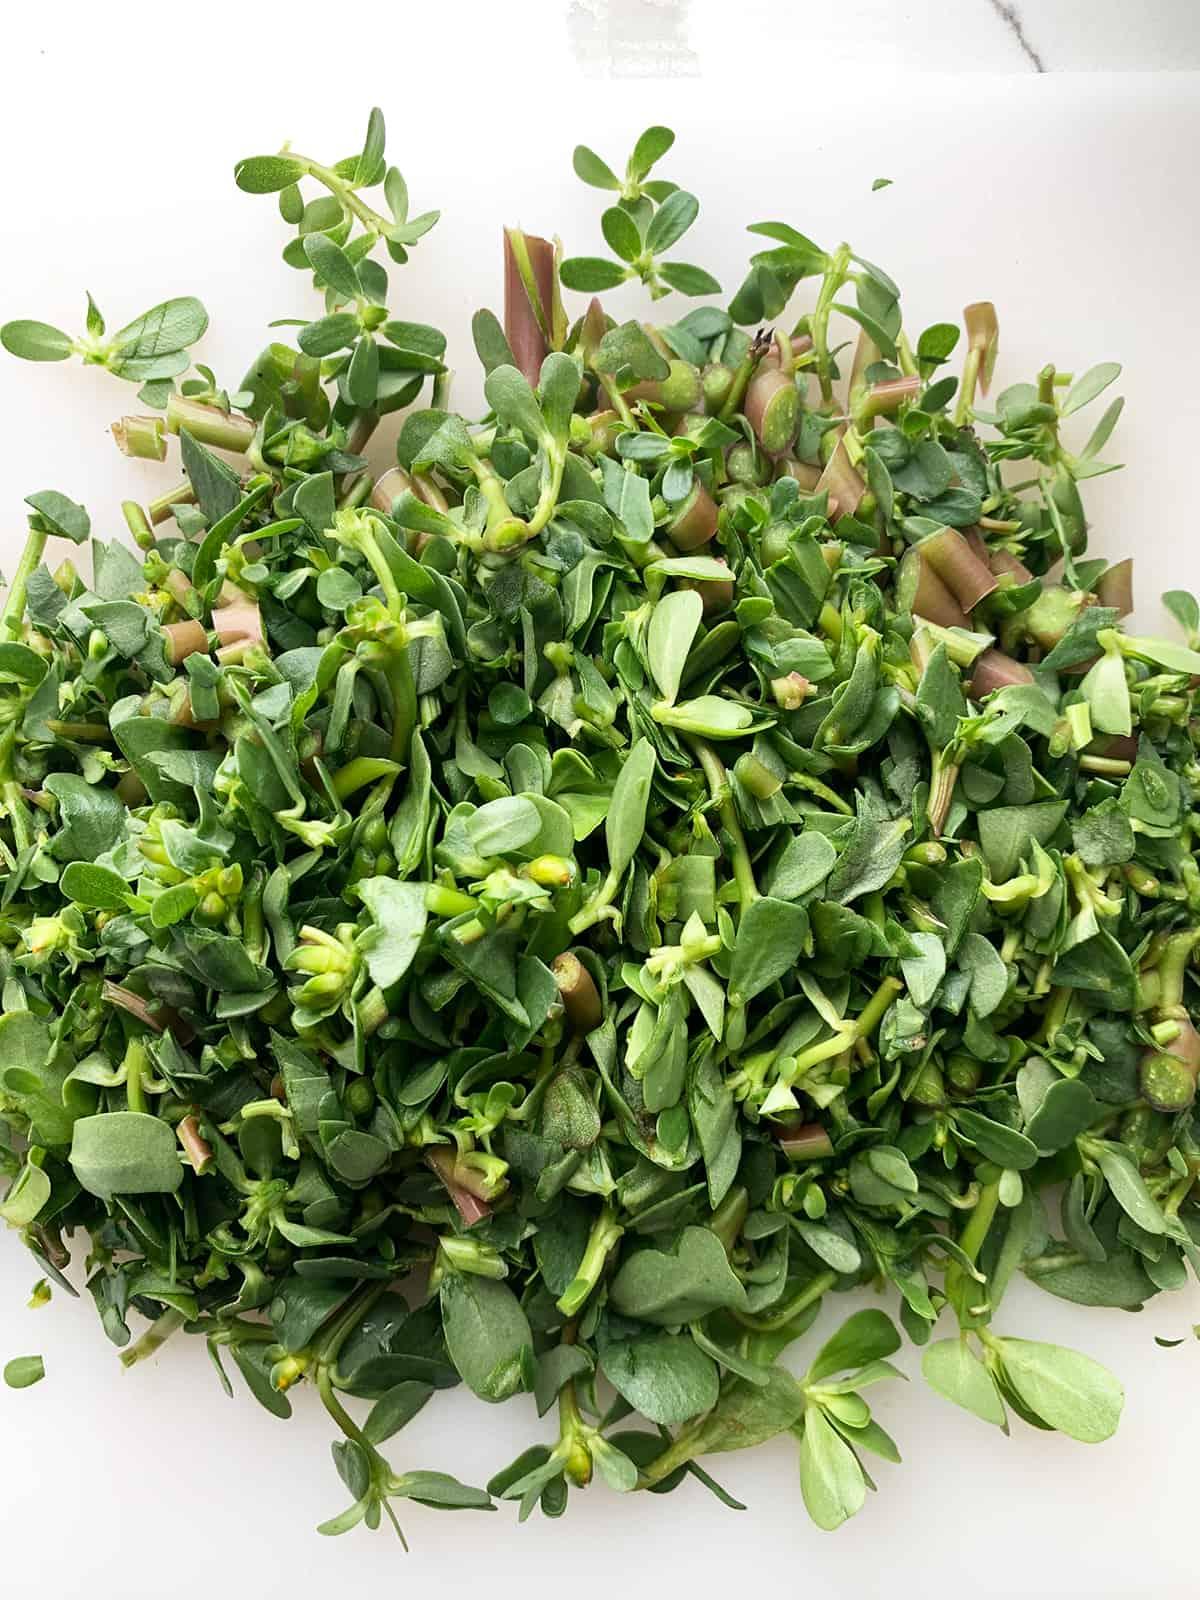 Purslane recipe - Roughly chopped purslane/bakleh freshly picked from the garden